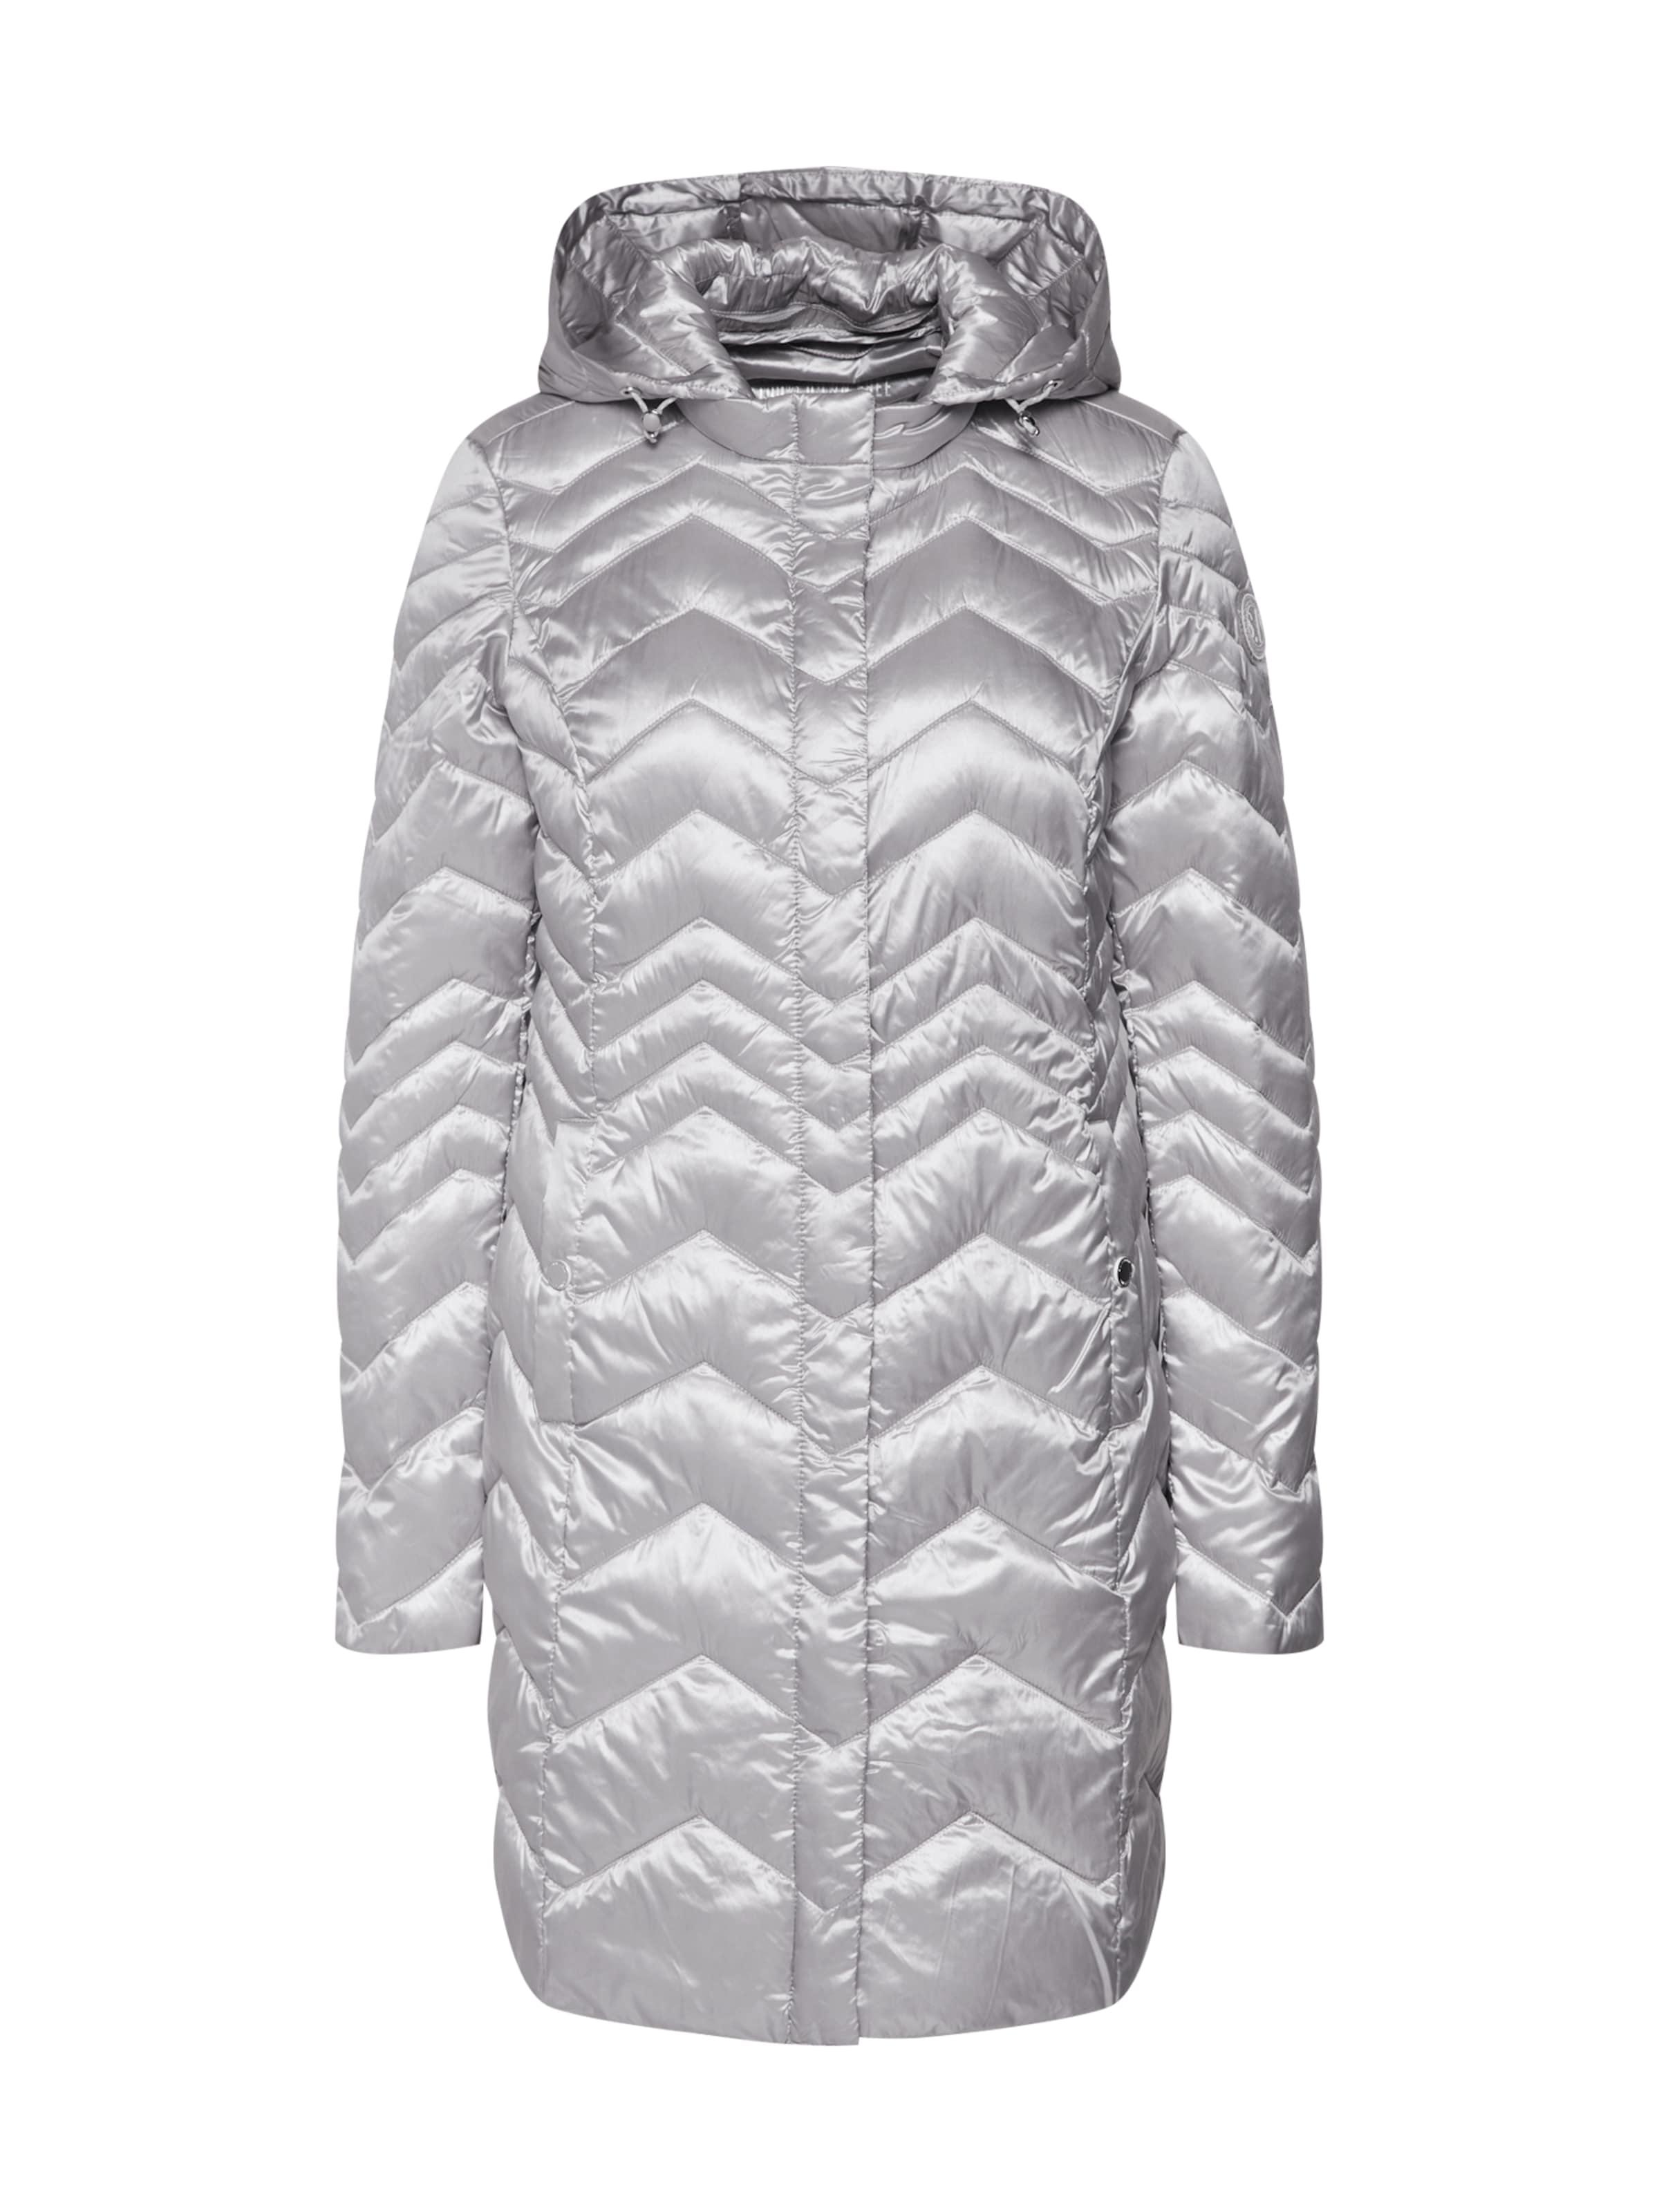 cc2af68a3 Zimný kabát Strieborná S.Oliver RED LABEL